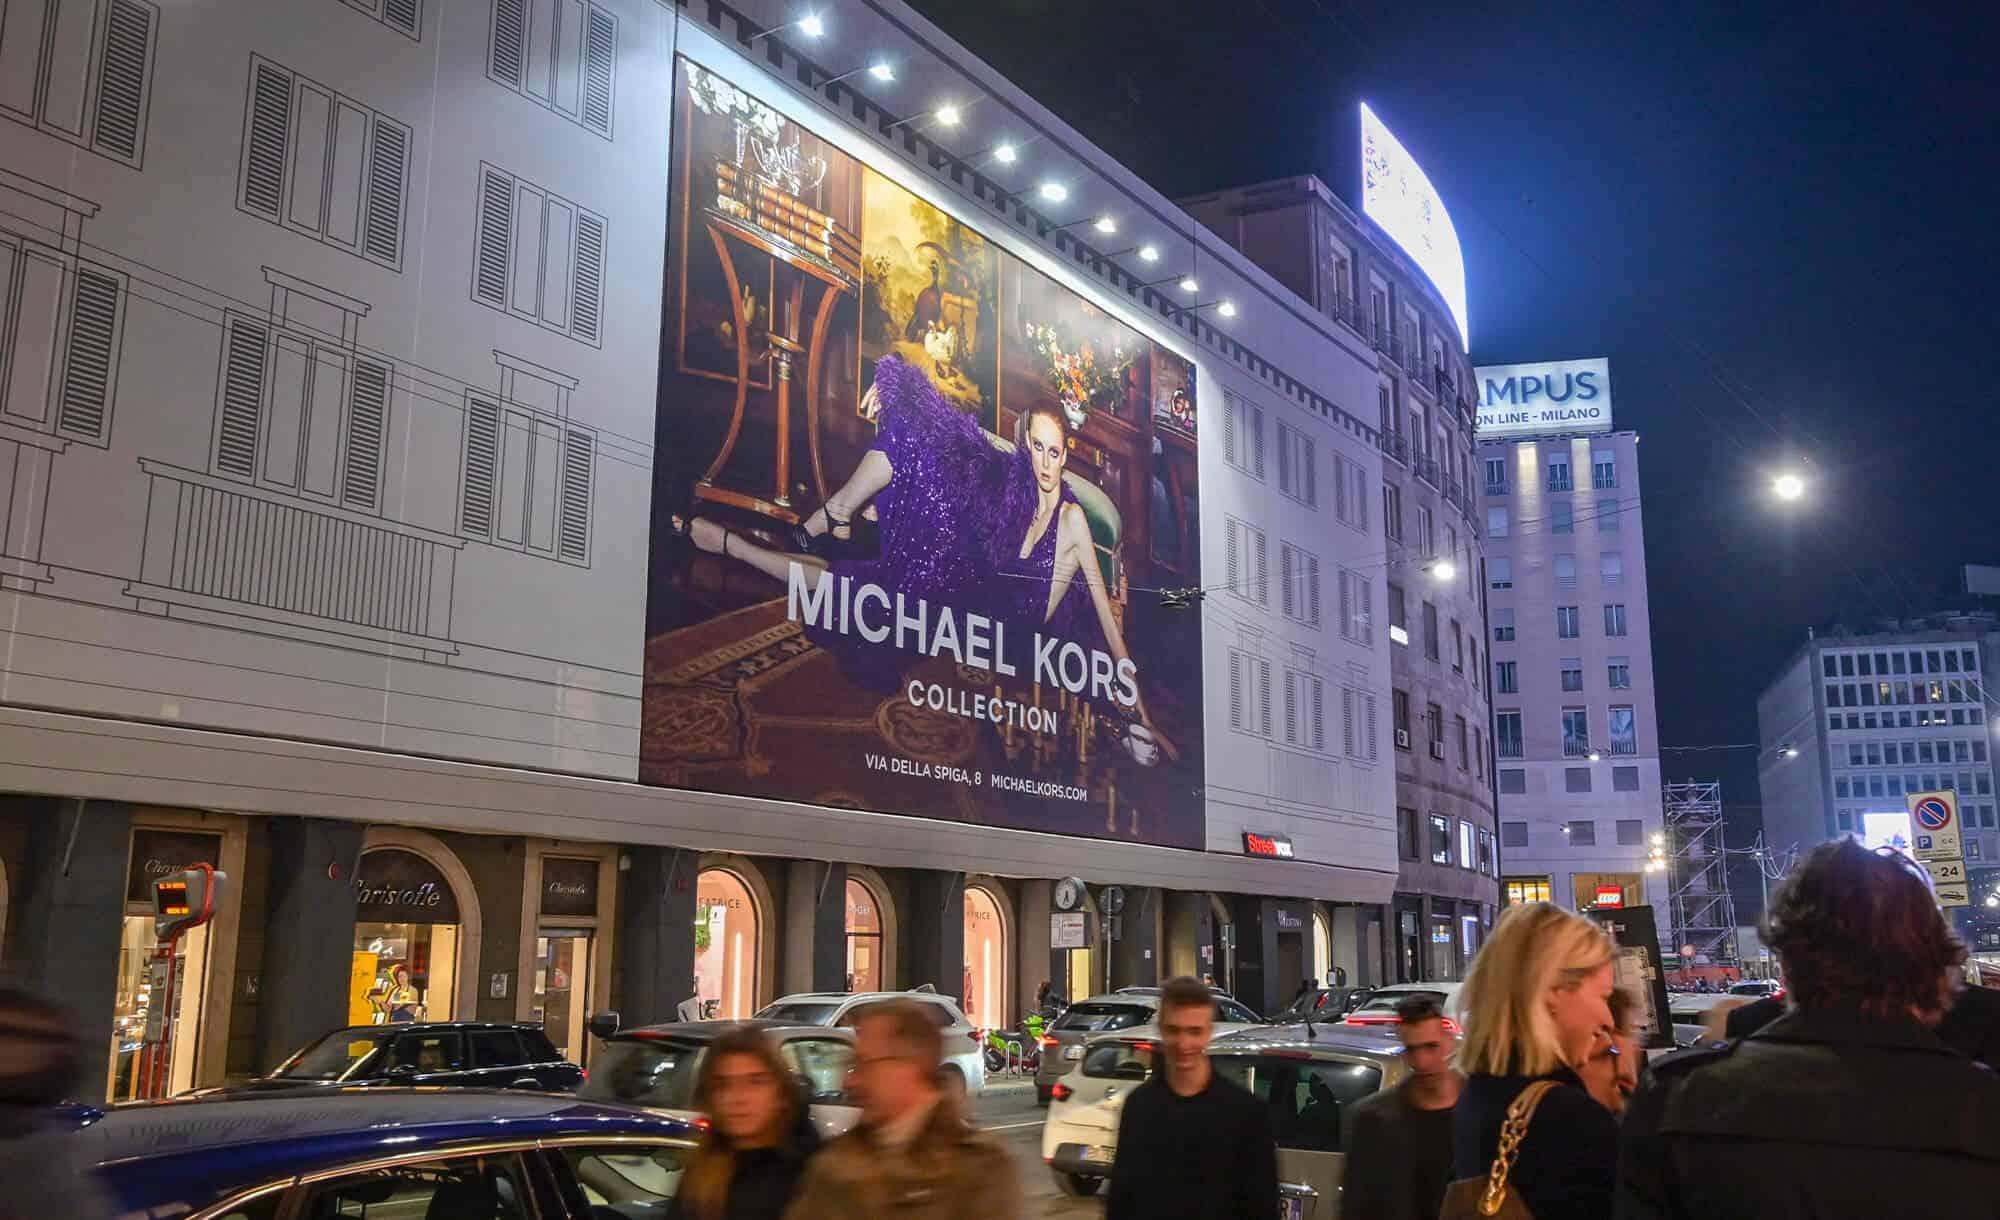 Maxi Affissione Streetvox in Venezia 6 Milano Michael Kors